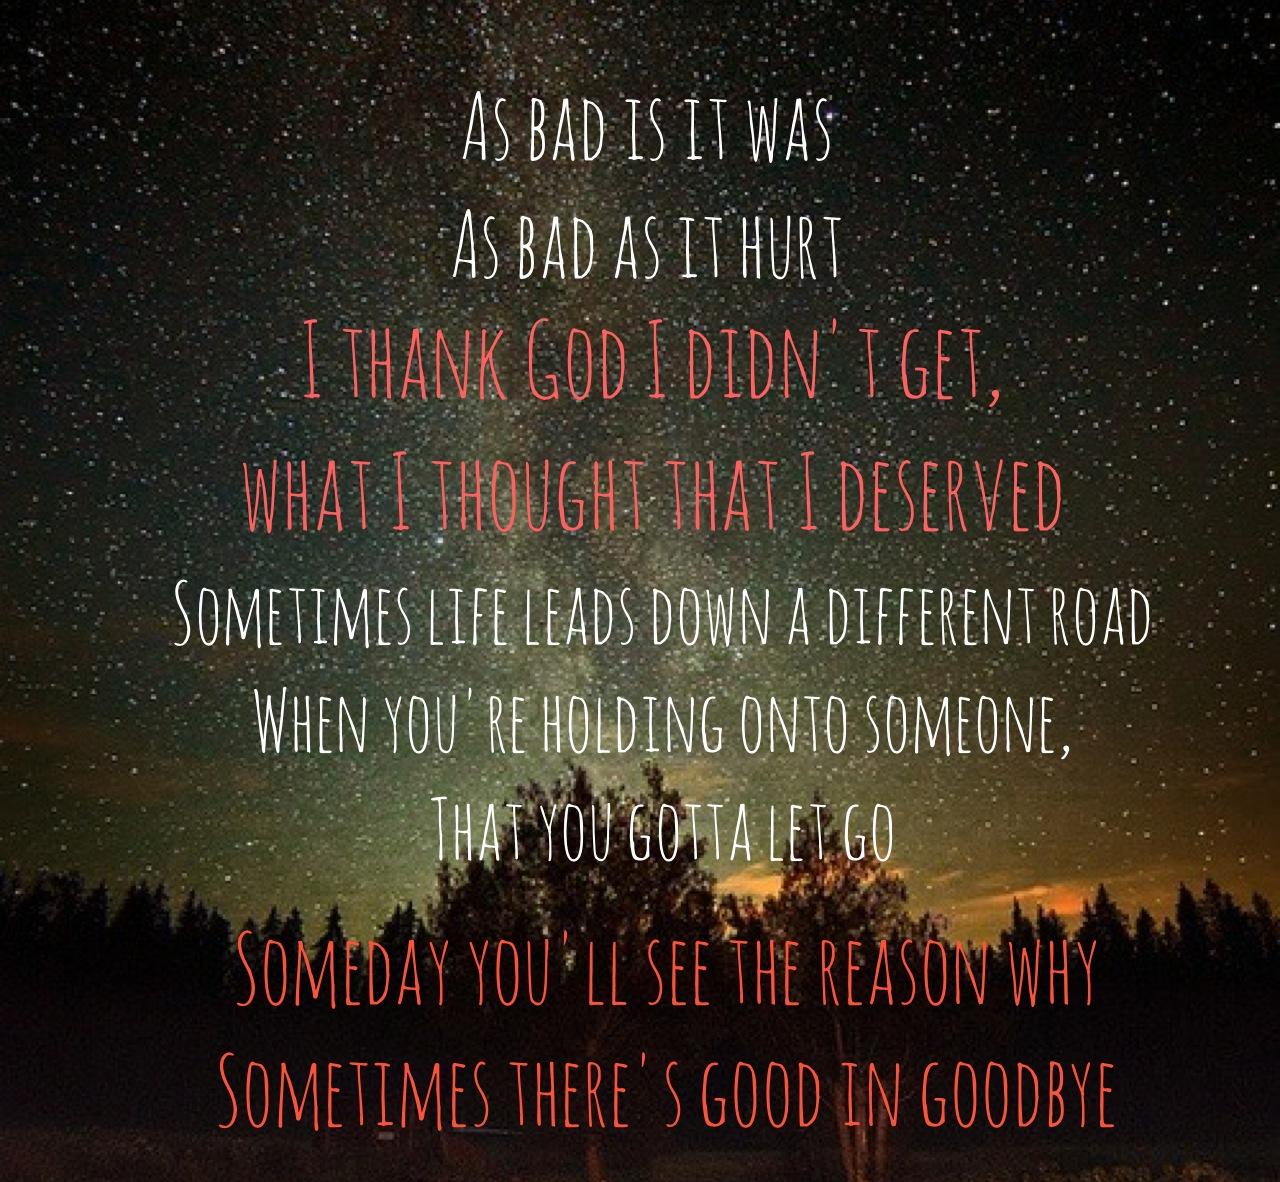 albert ryan we meet again lyrics